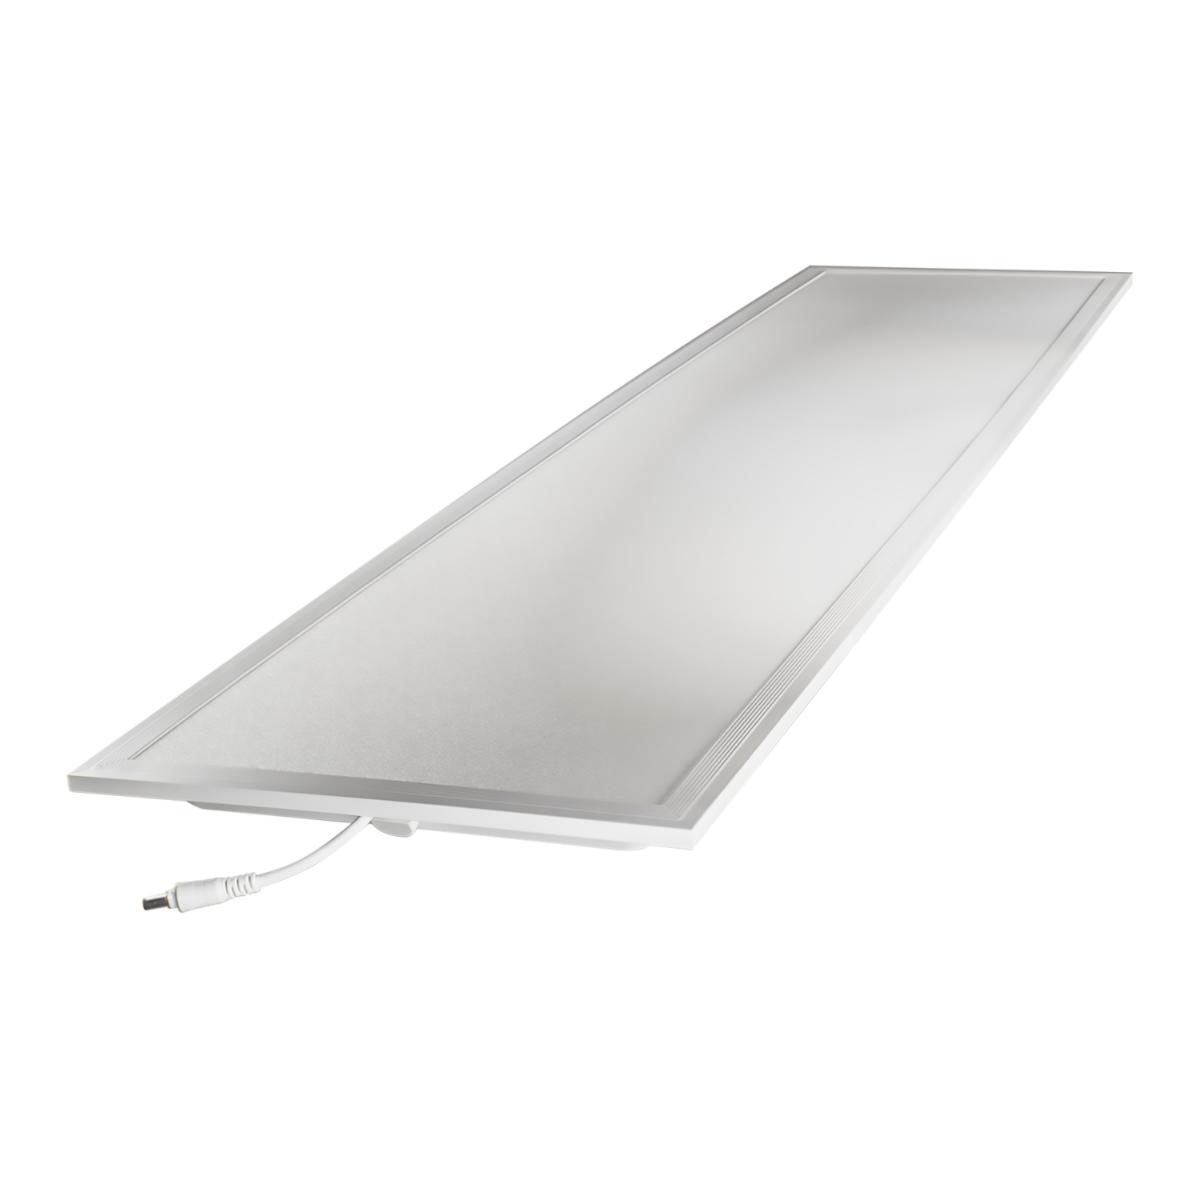 Noxion LED Paneel Delta Pro V2.0 Xitanium DALI 30W 30x120cm 3000K 3960lm UGR <19   Dali Dimbaar - Vervanger voor 2x36W